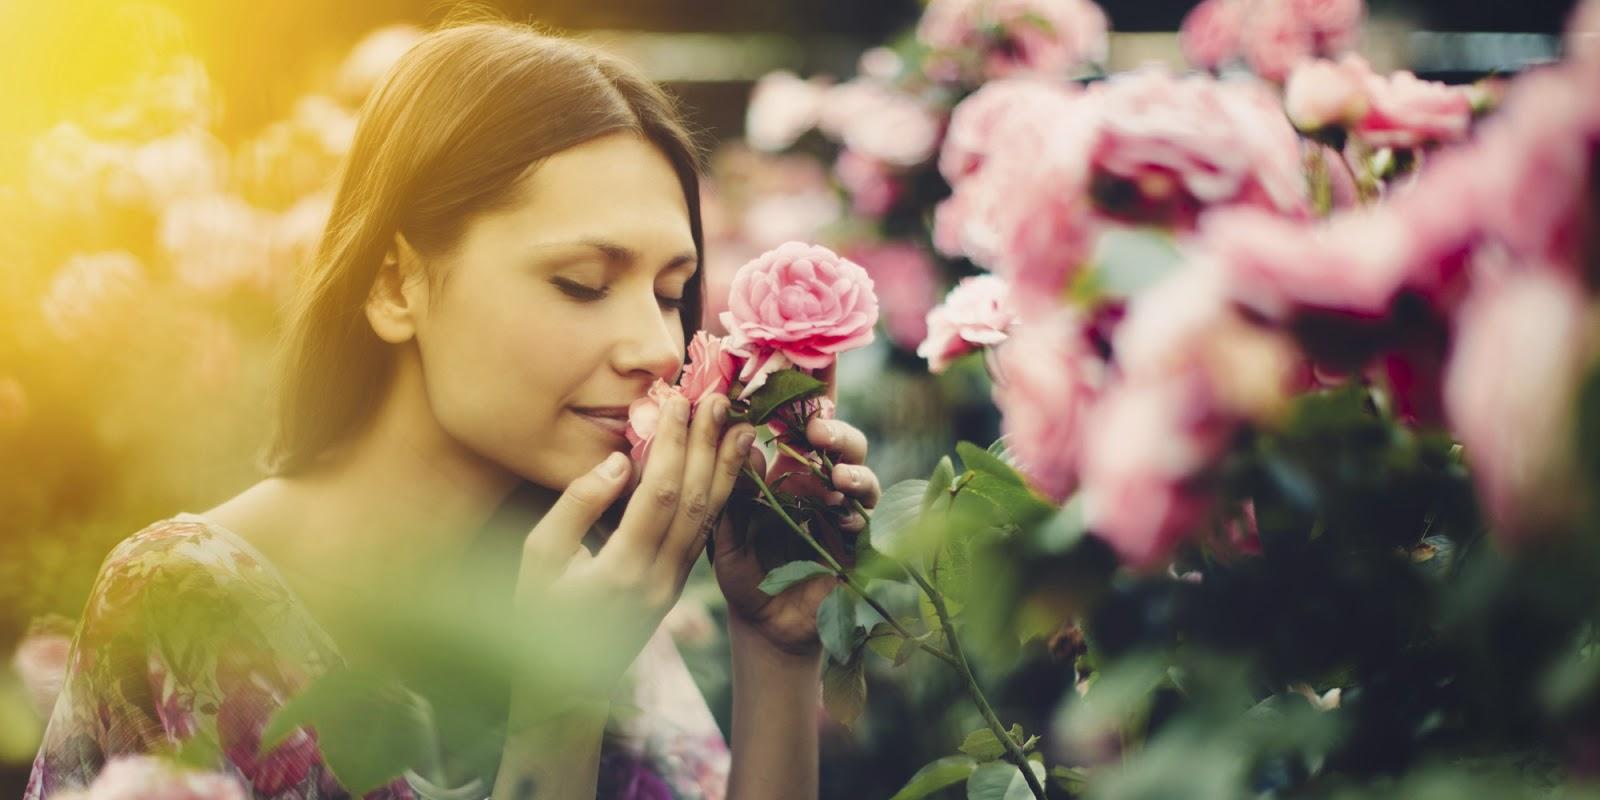 mujer-oliendo-rosas